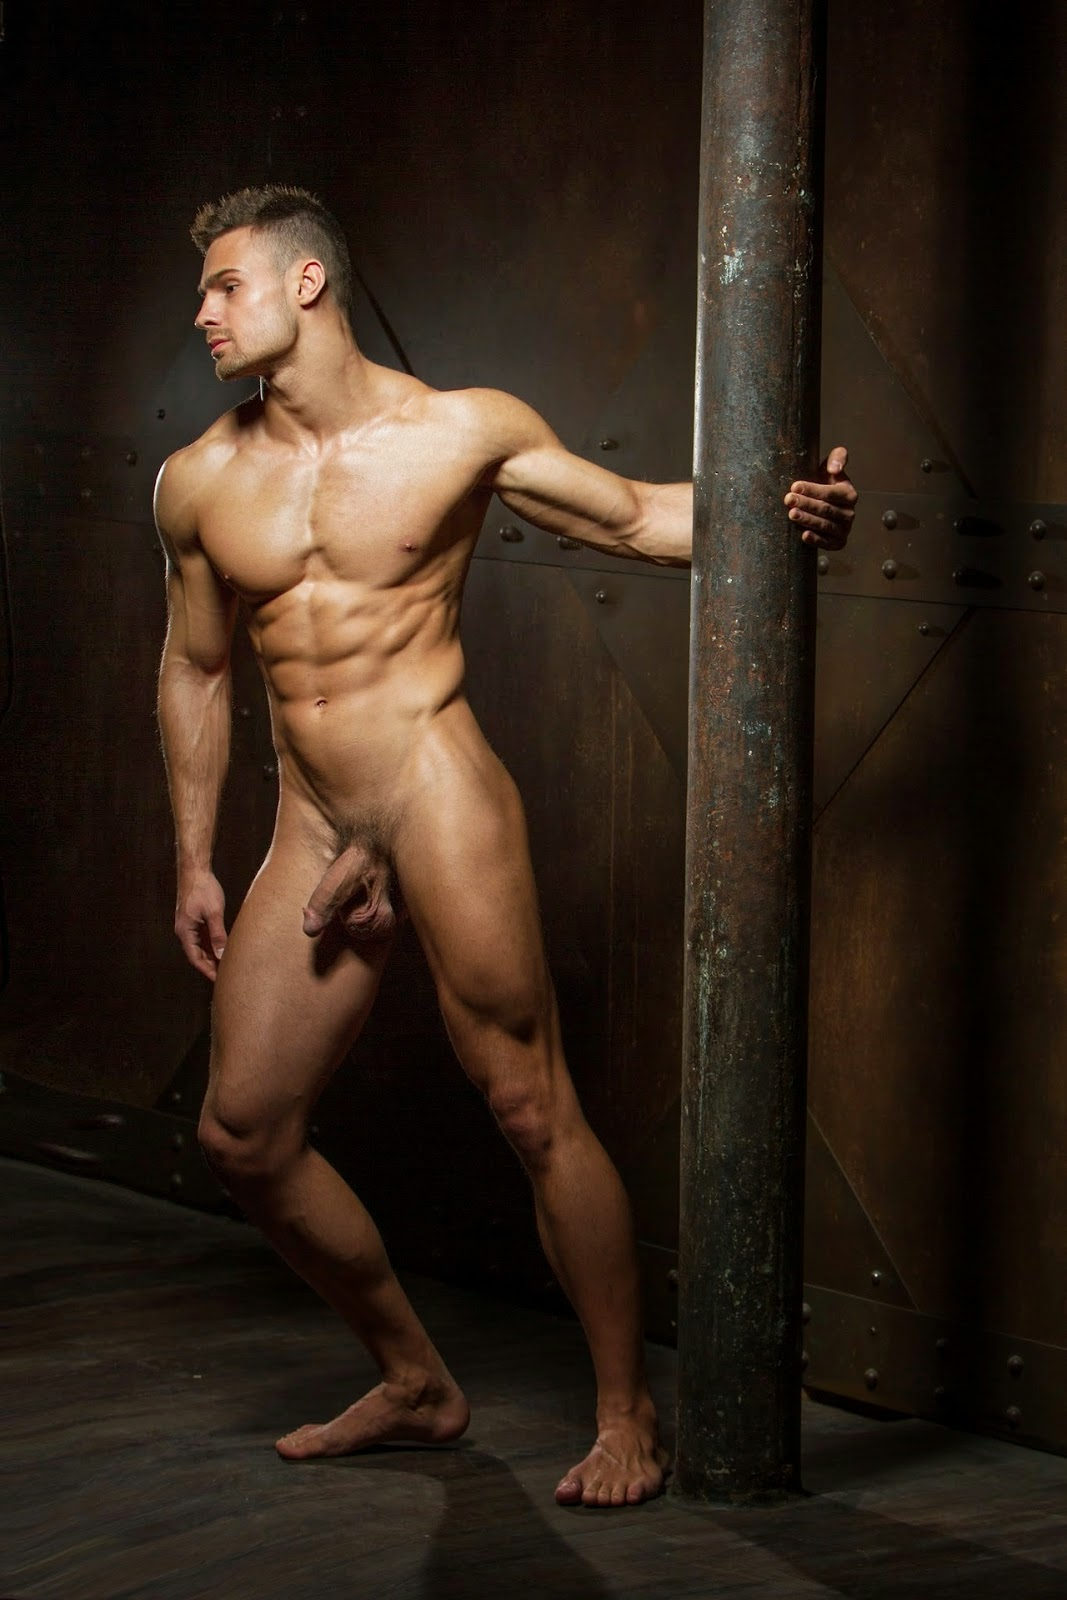 Naked Frontal men